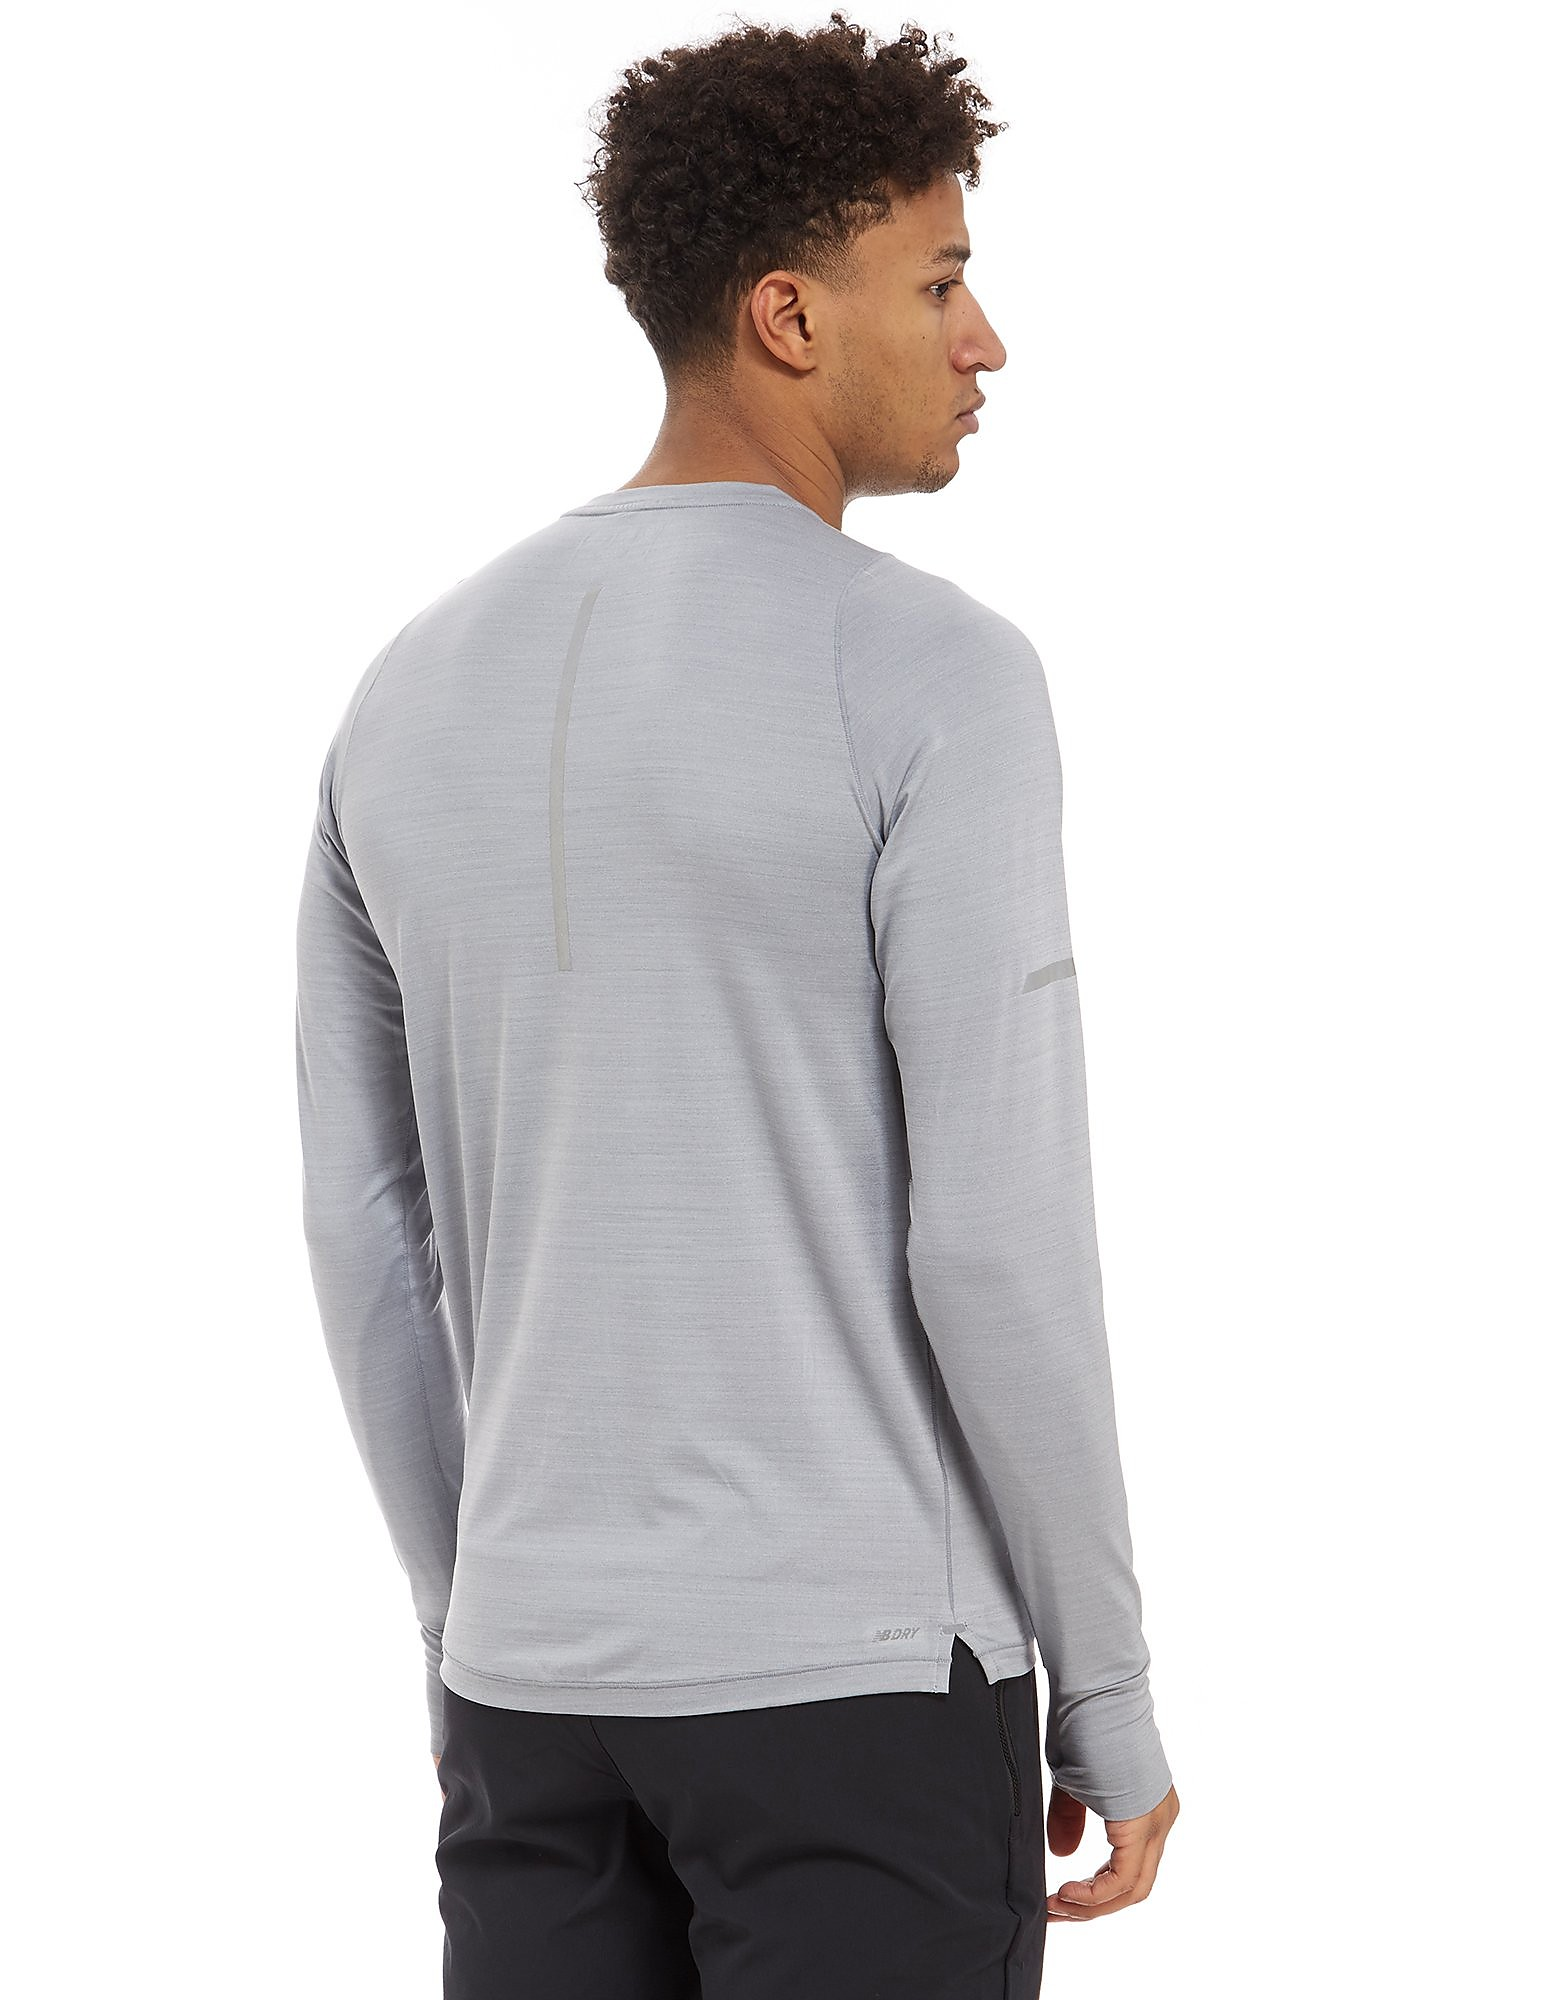 New Balance Seasonless Long Sleeve T-Shirt